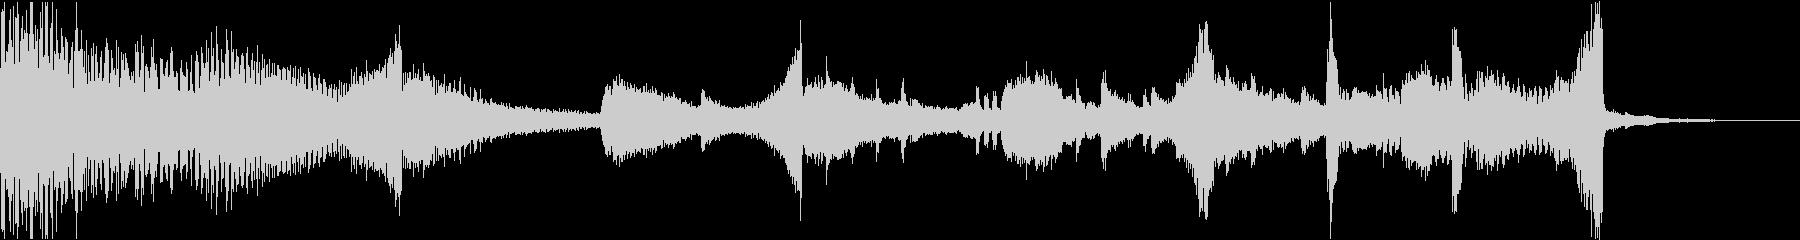 CM映画ピアノストリングスコーポレートfの未再生の波形